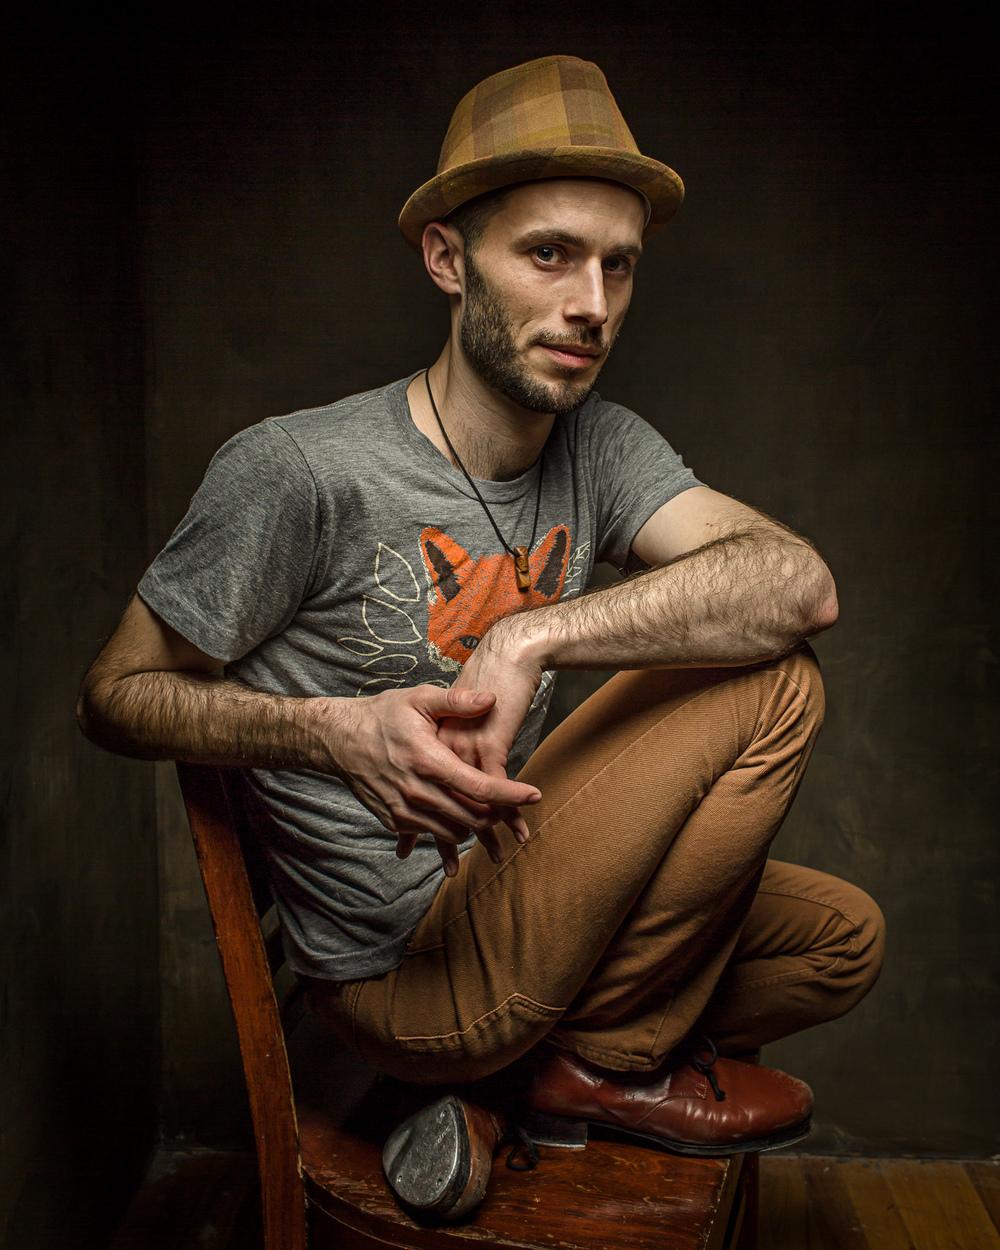 Corner Portrait - Photo by Bill Wadman